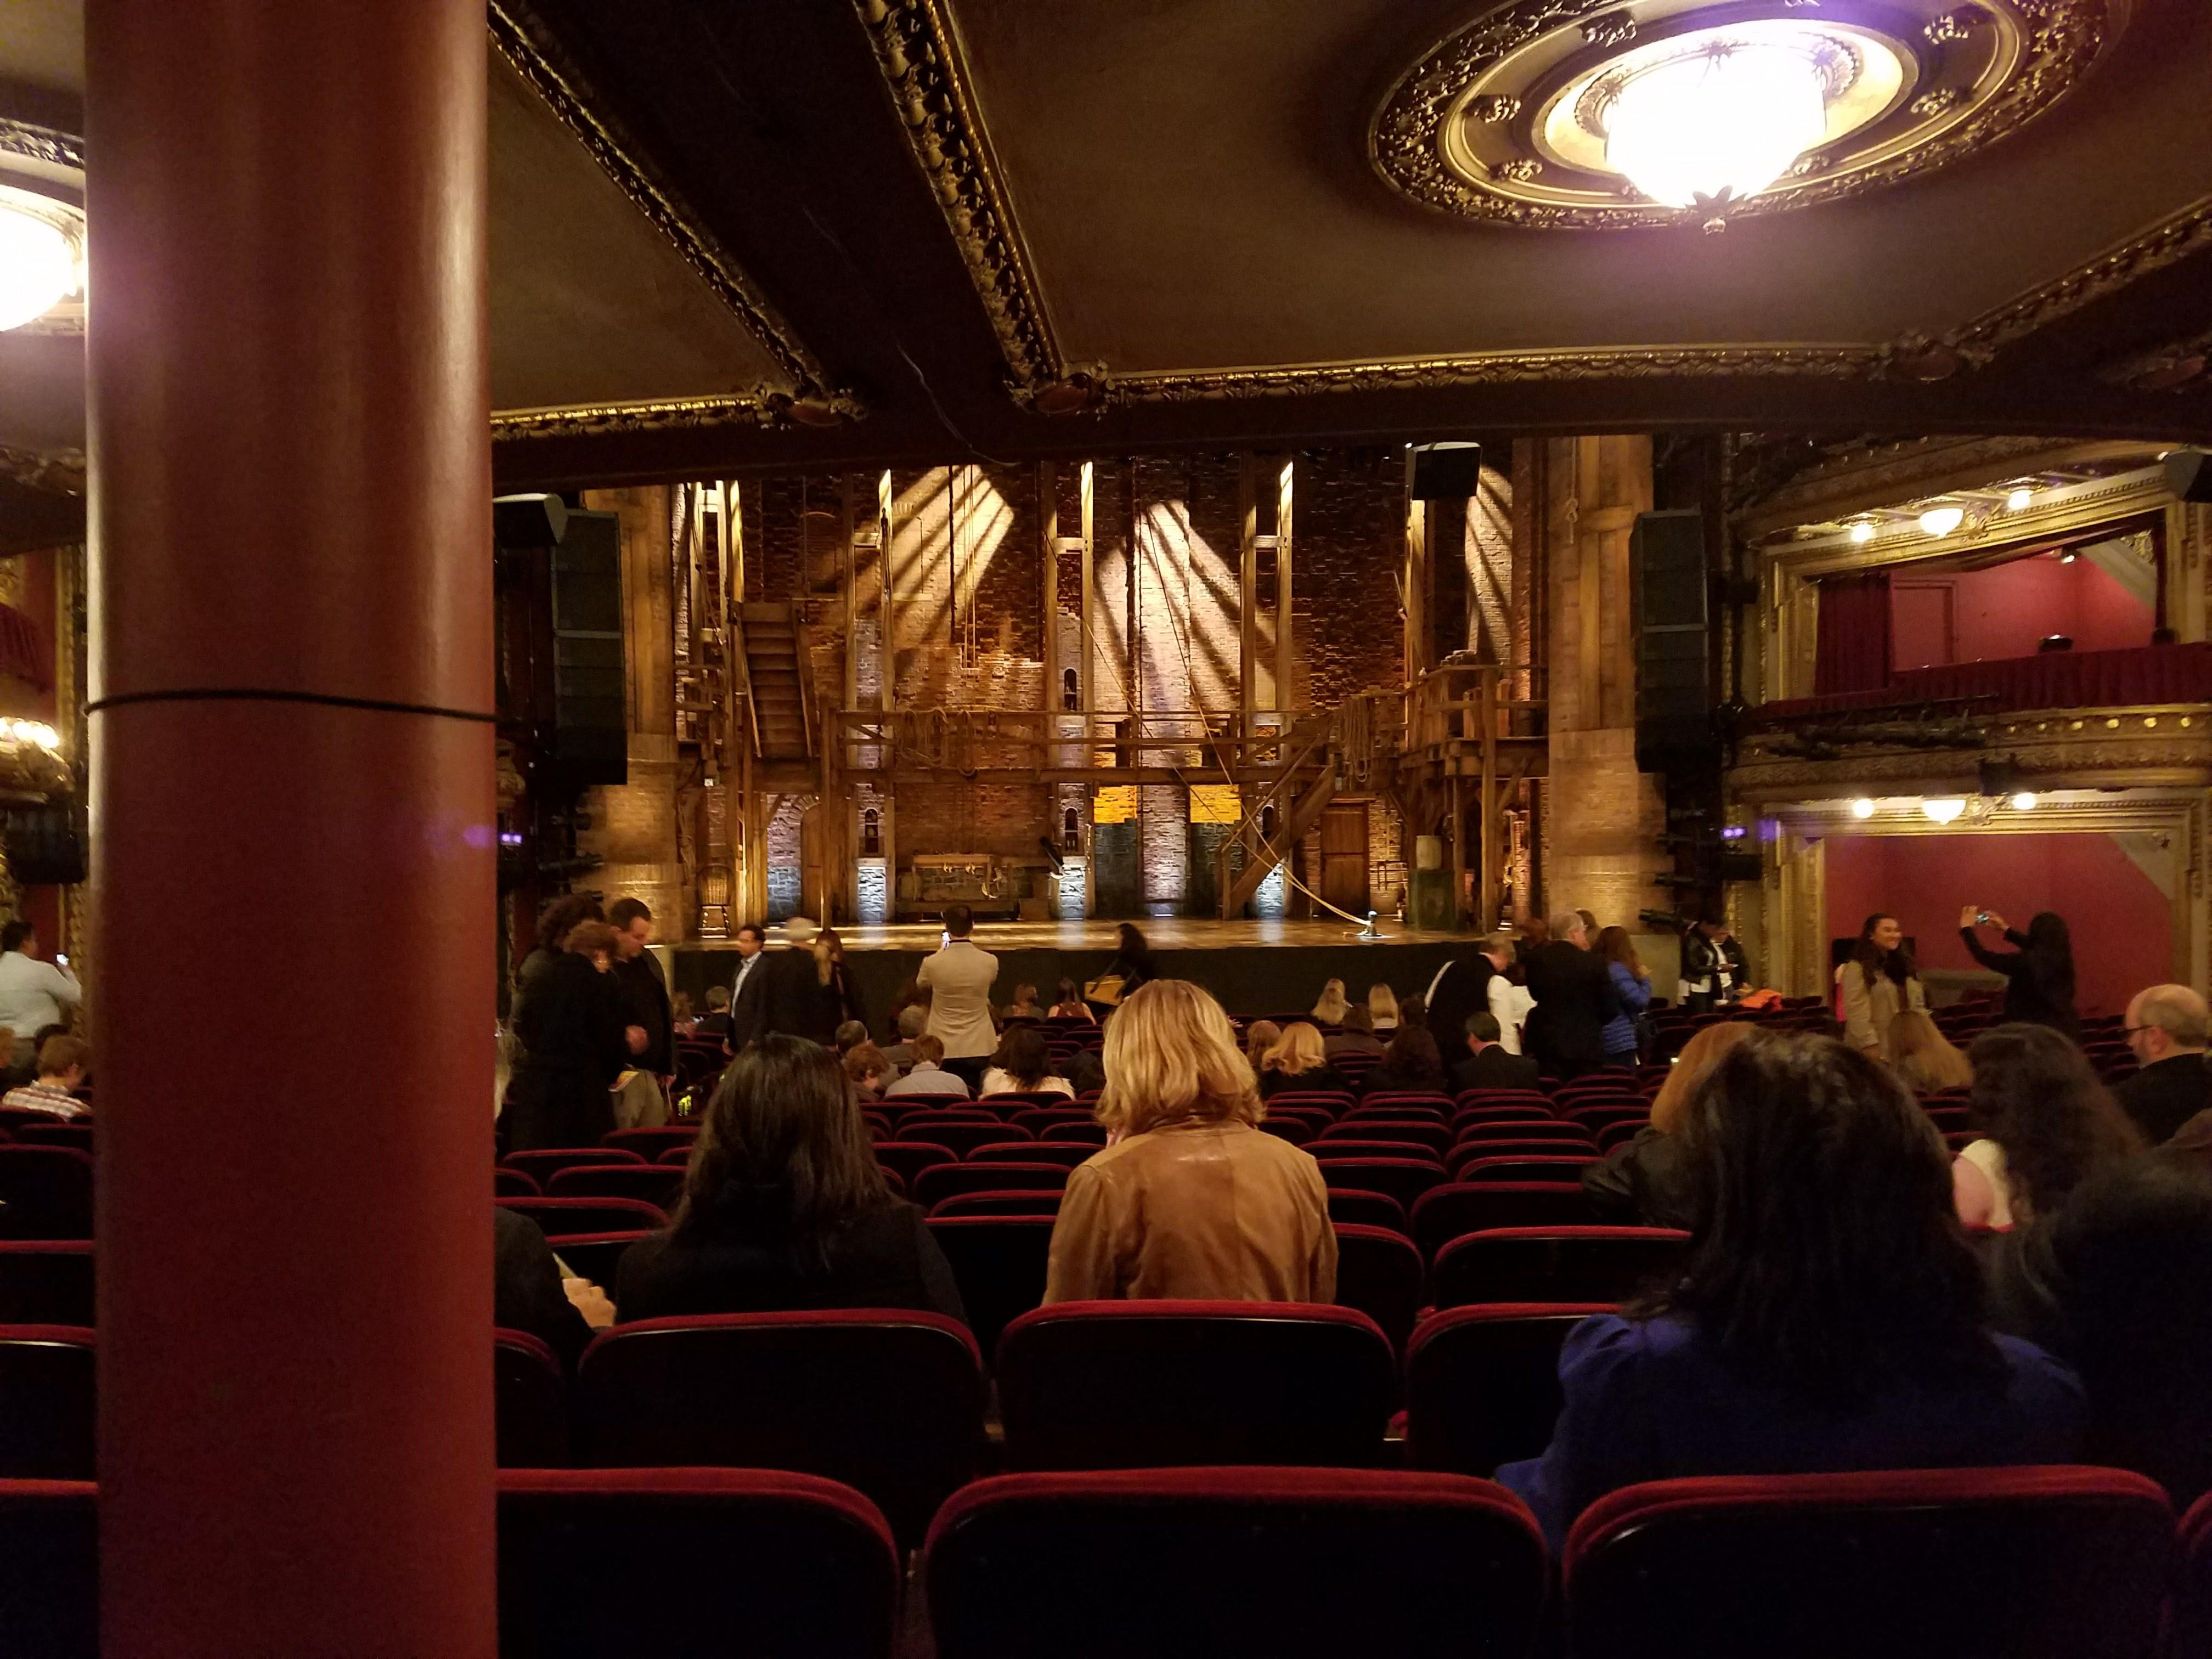 CIBC Theatre Section Orchestra C Row X Seat 109